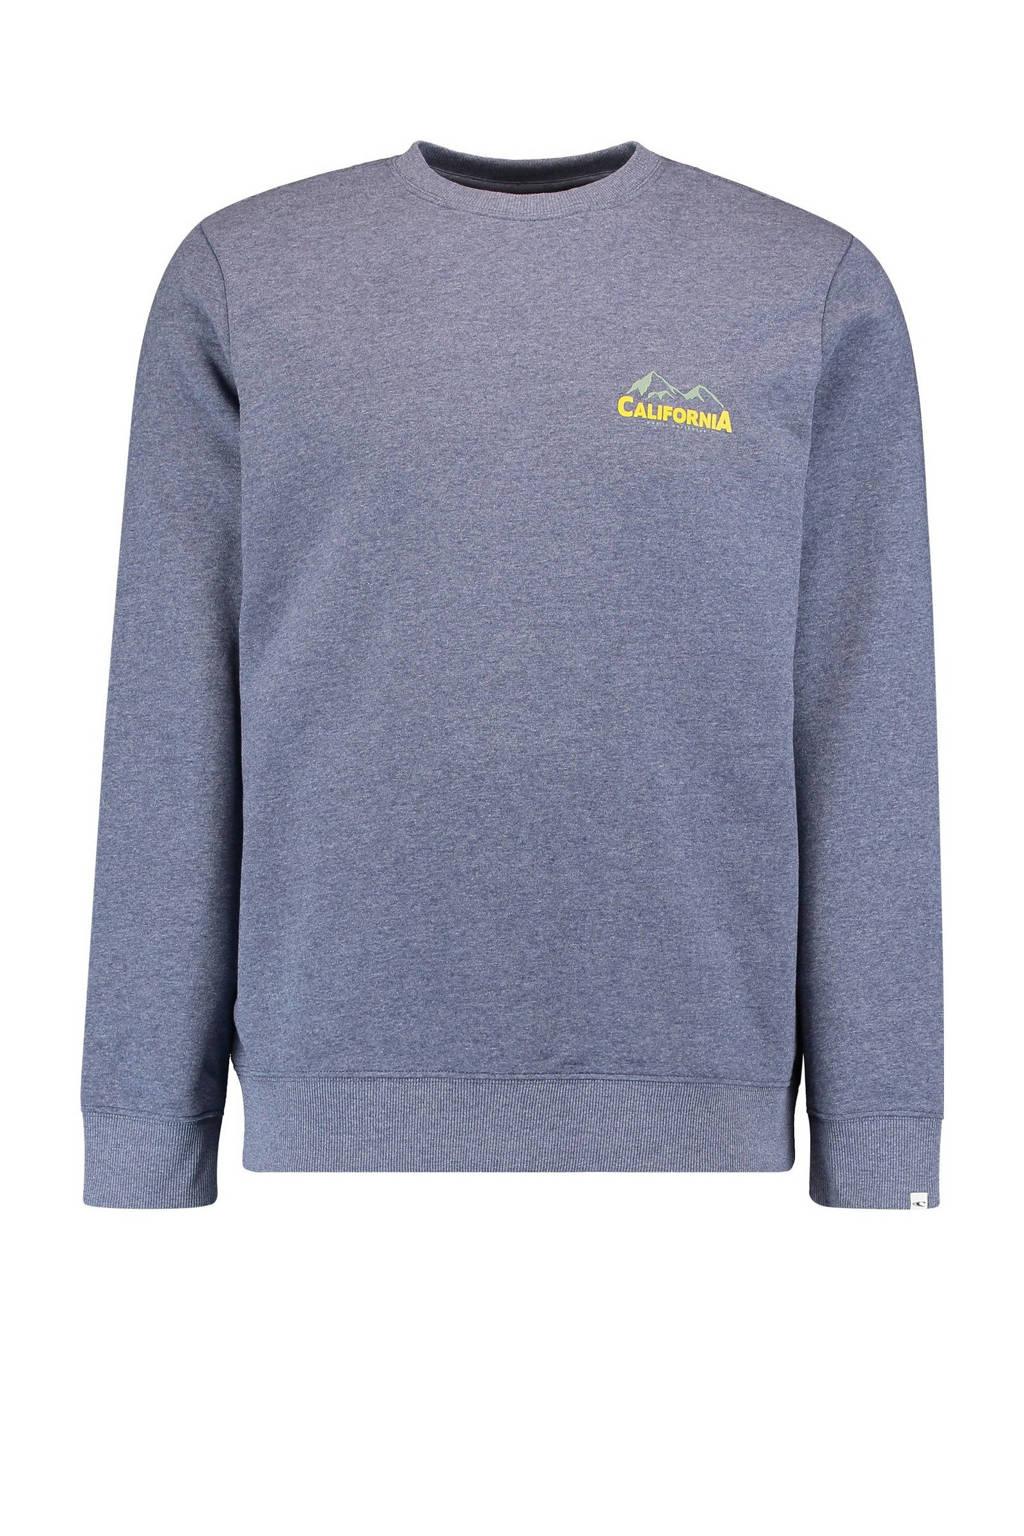 O'Neill sweater Cali blauw, Blauw